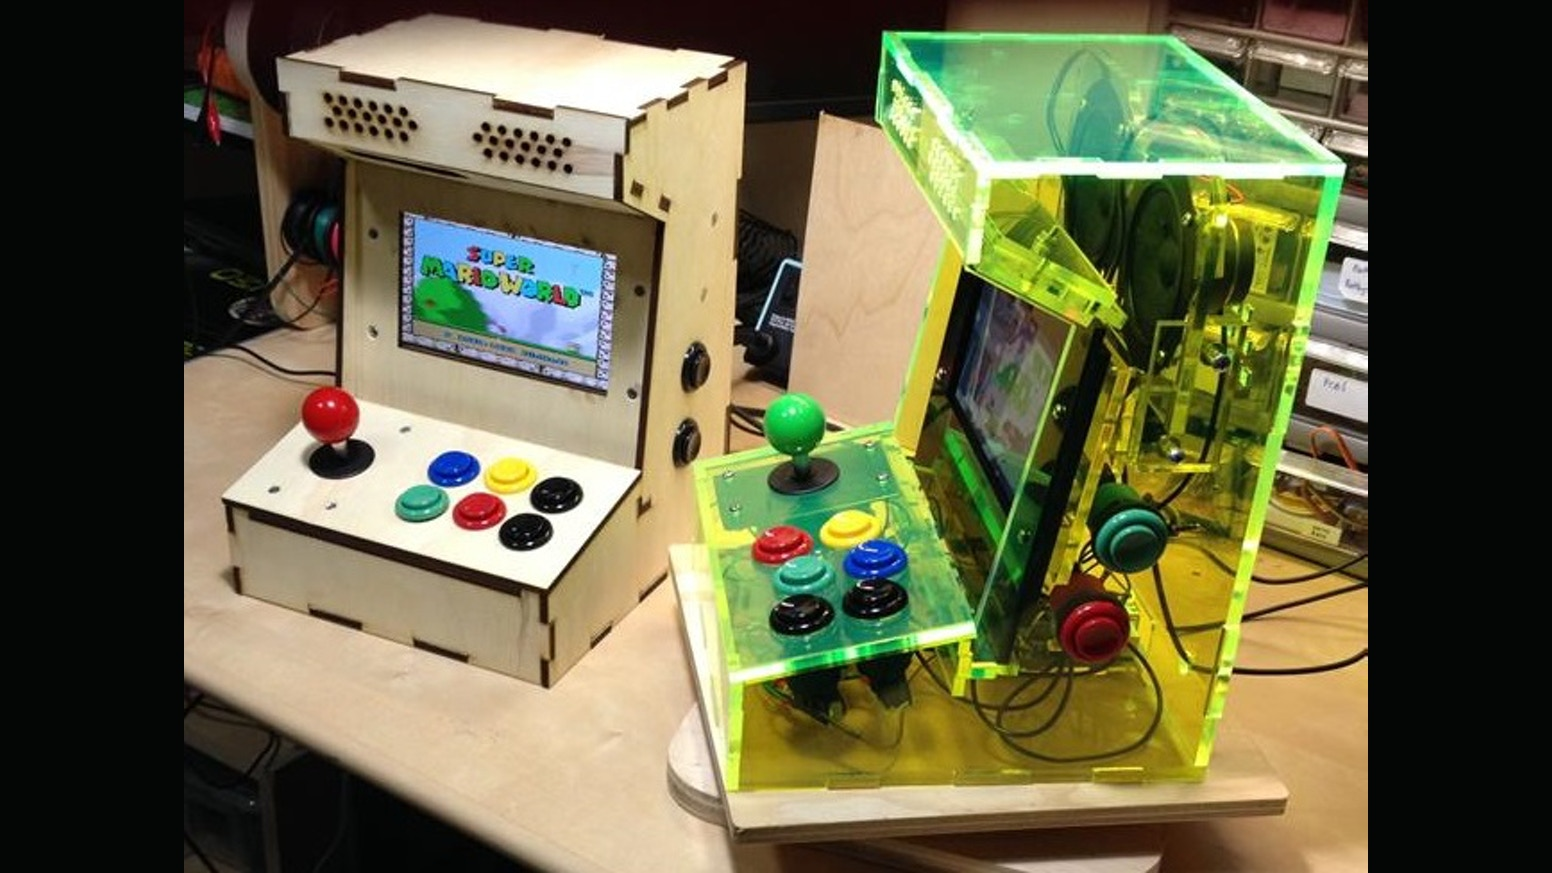 Raspberry Pi Game Cabinet Porta Pi Arcade A Diy Mini Arcade Cabinet For Raspberry Pi By